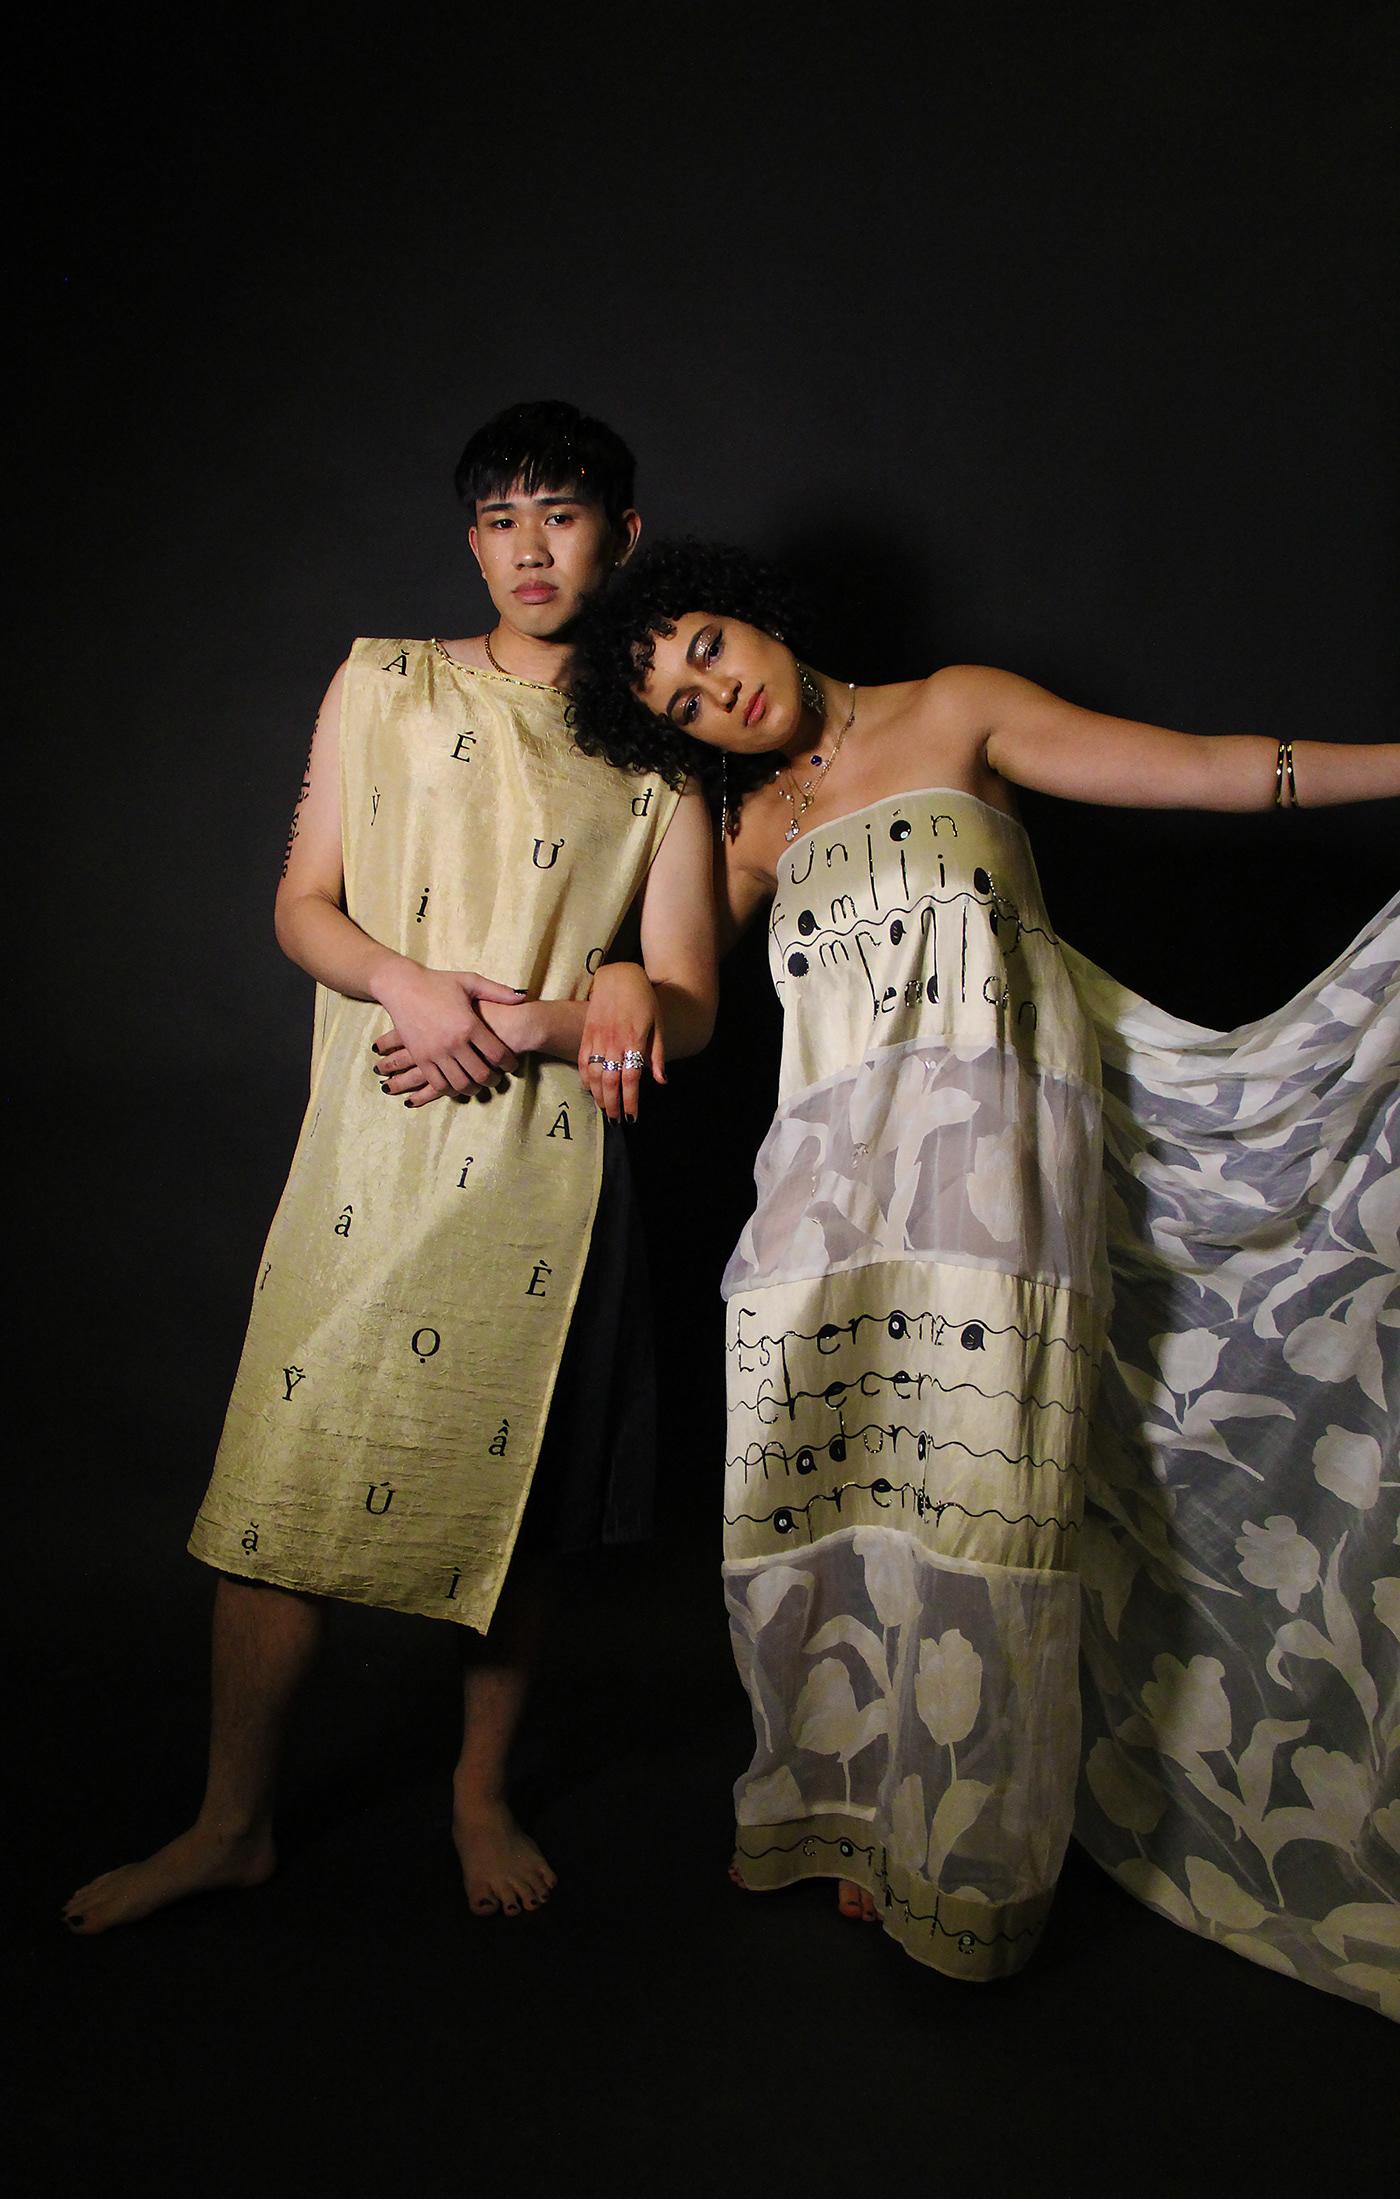 Fashion  fashion design typography   Calligraphy   language translation graphic design  Photography  fashion photography adobeawards